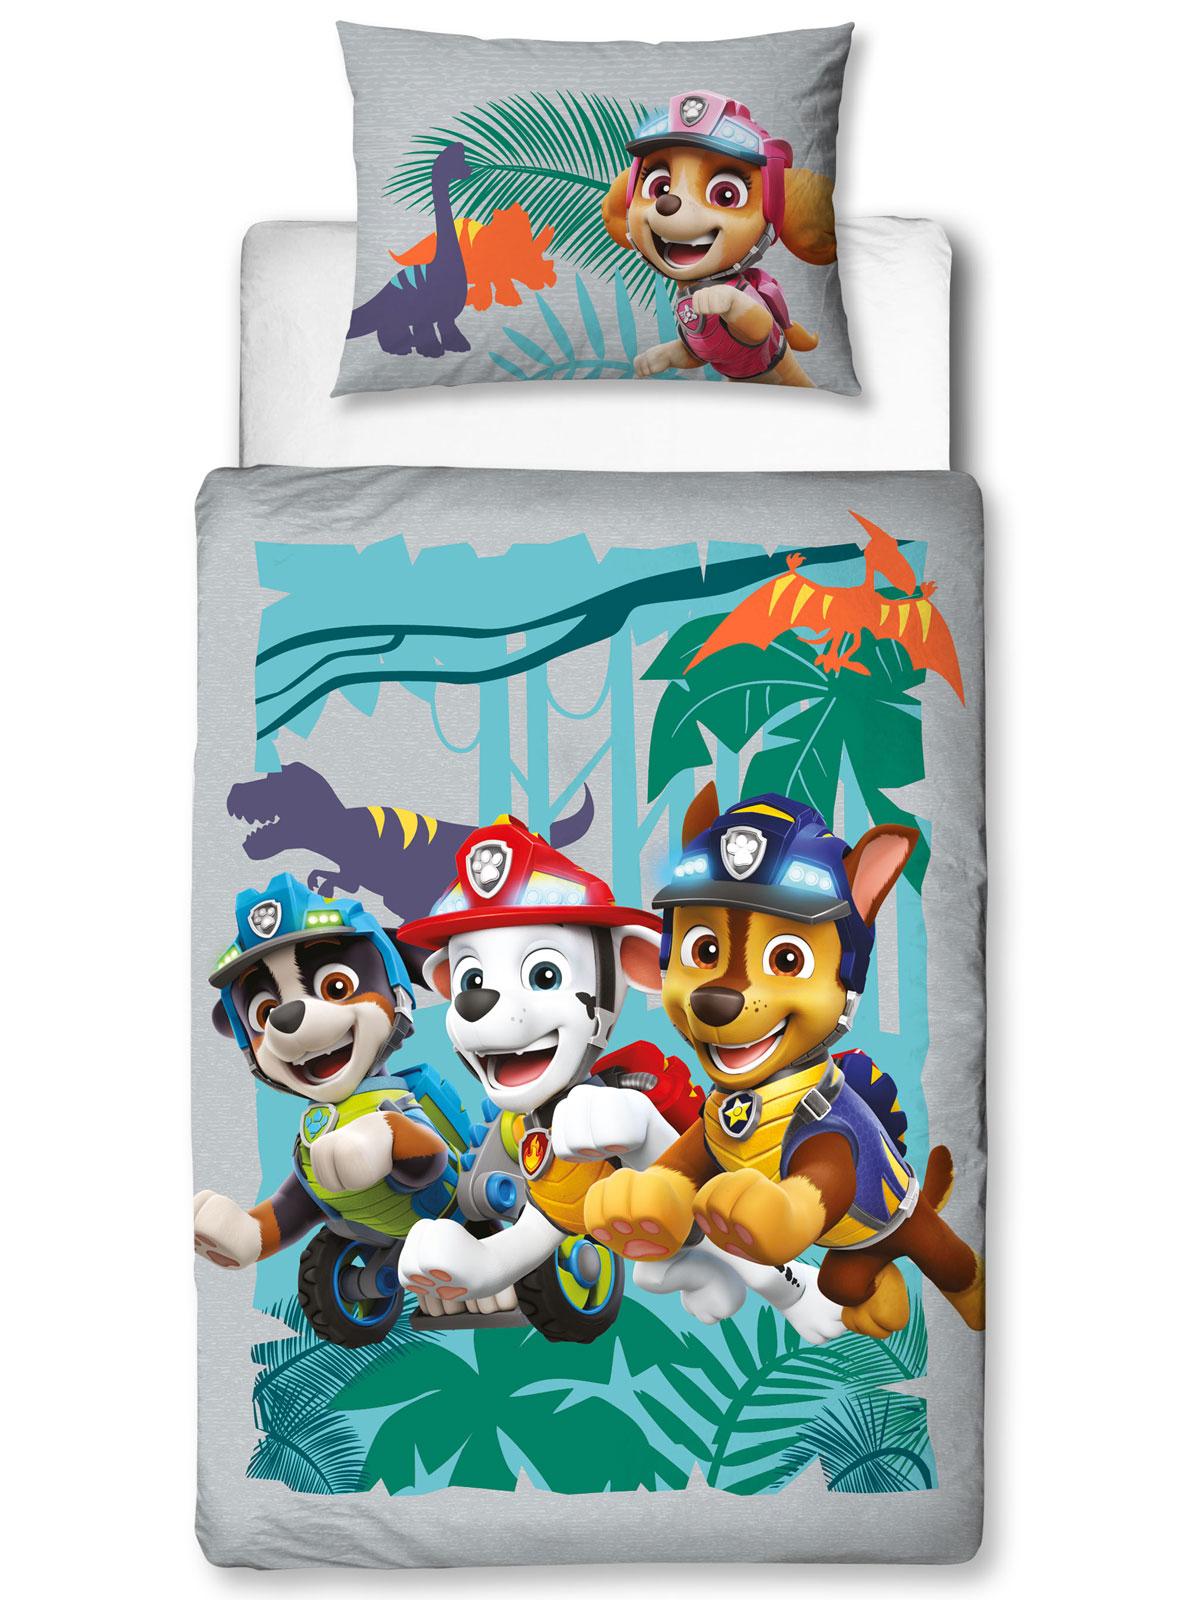 Paw Patrol Dino Junior Toddler Duvet Cover Set